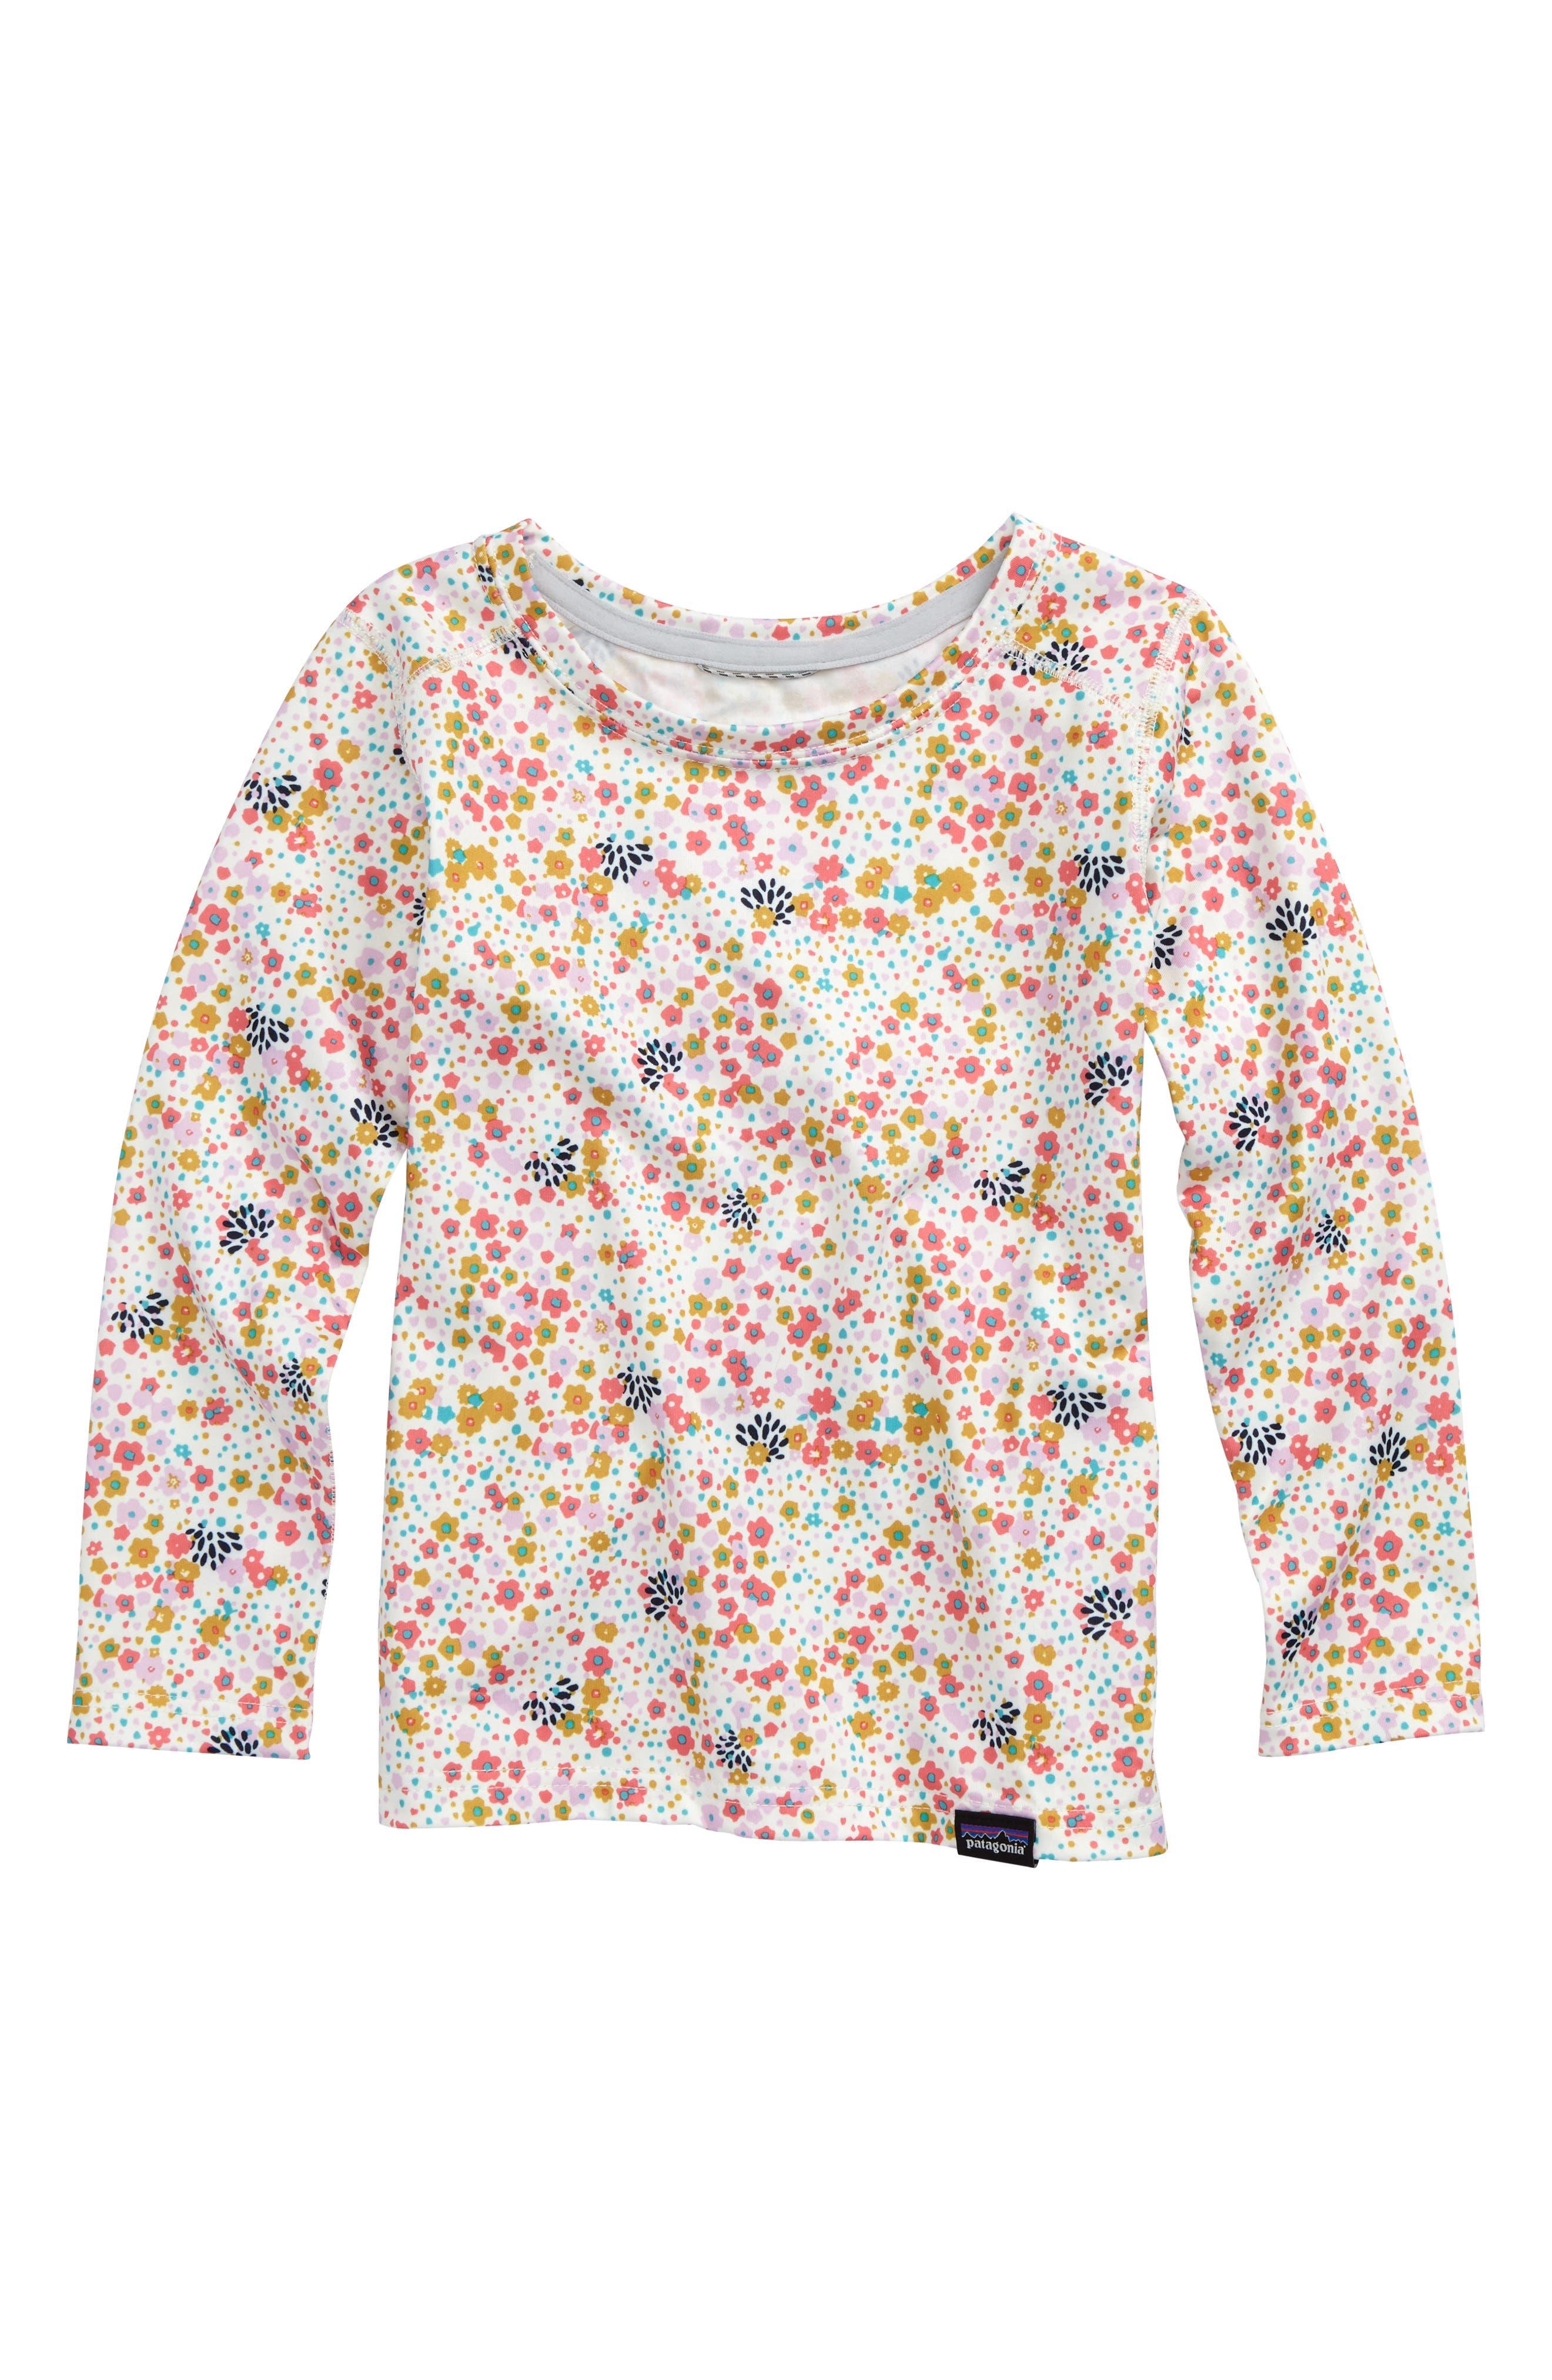 Patagonia Capilene Print Shirt (Toddler Girls & Little Girls)